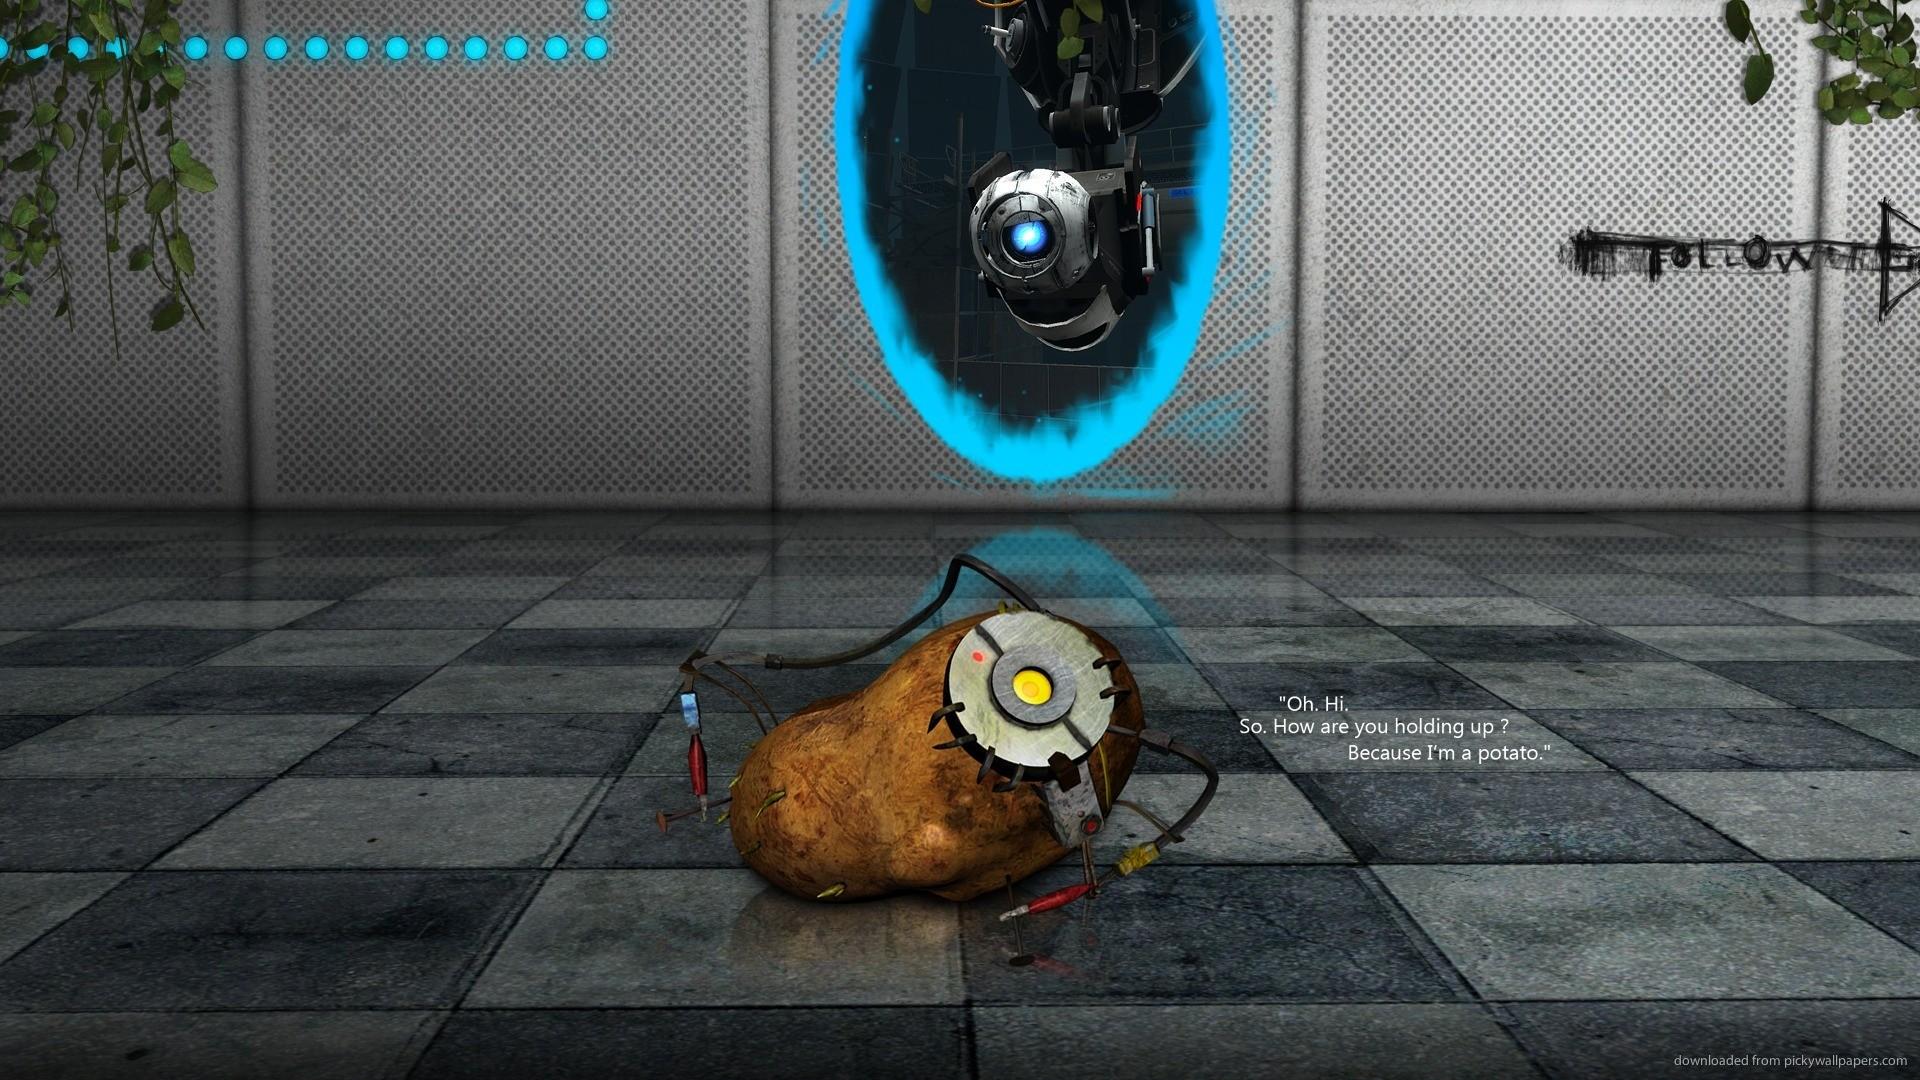 GLaDOS as a potato picture